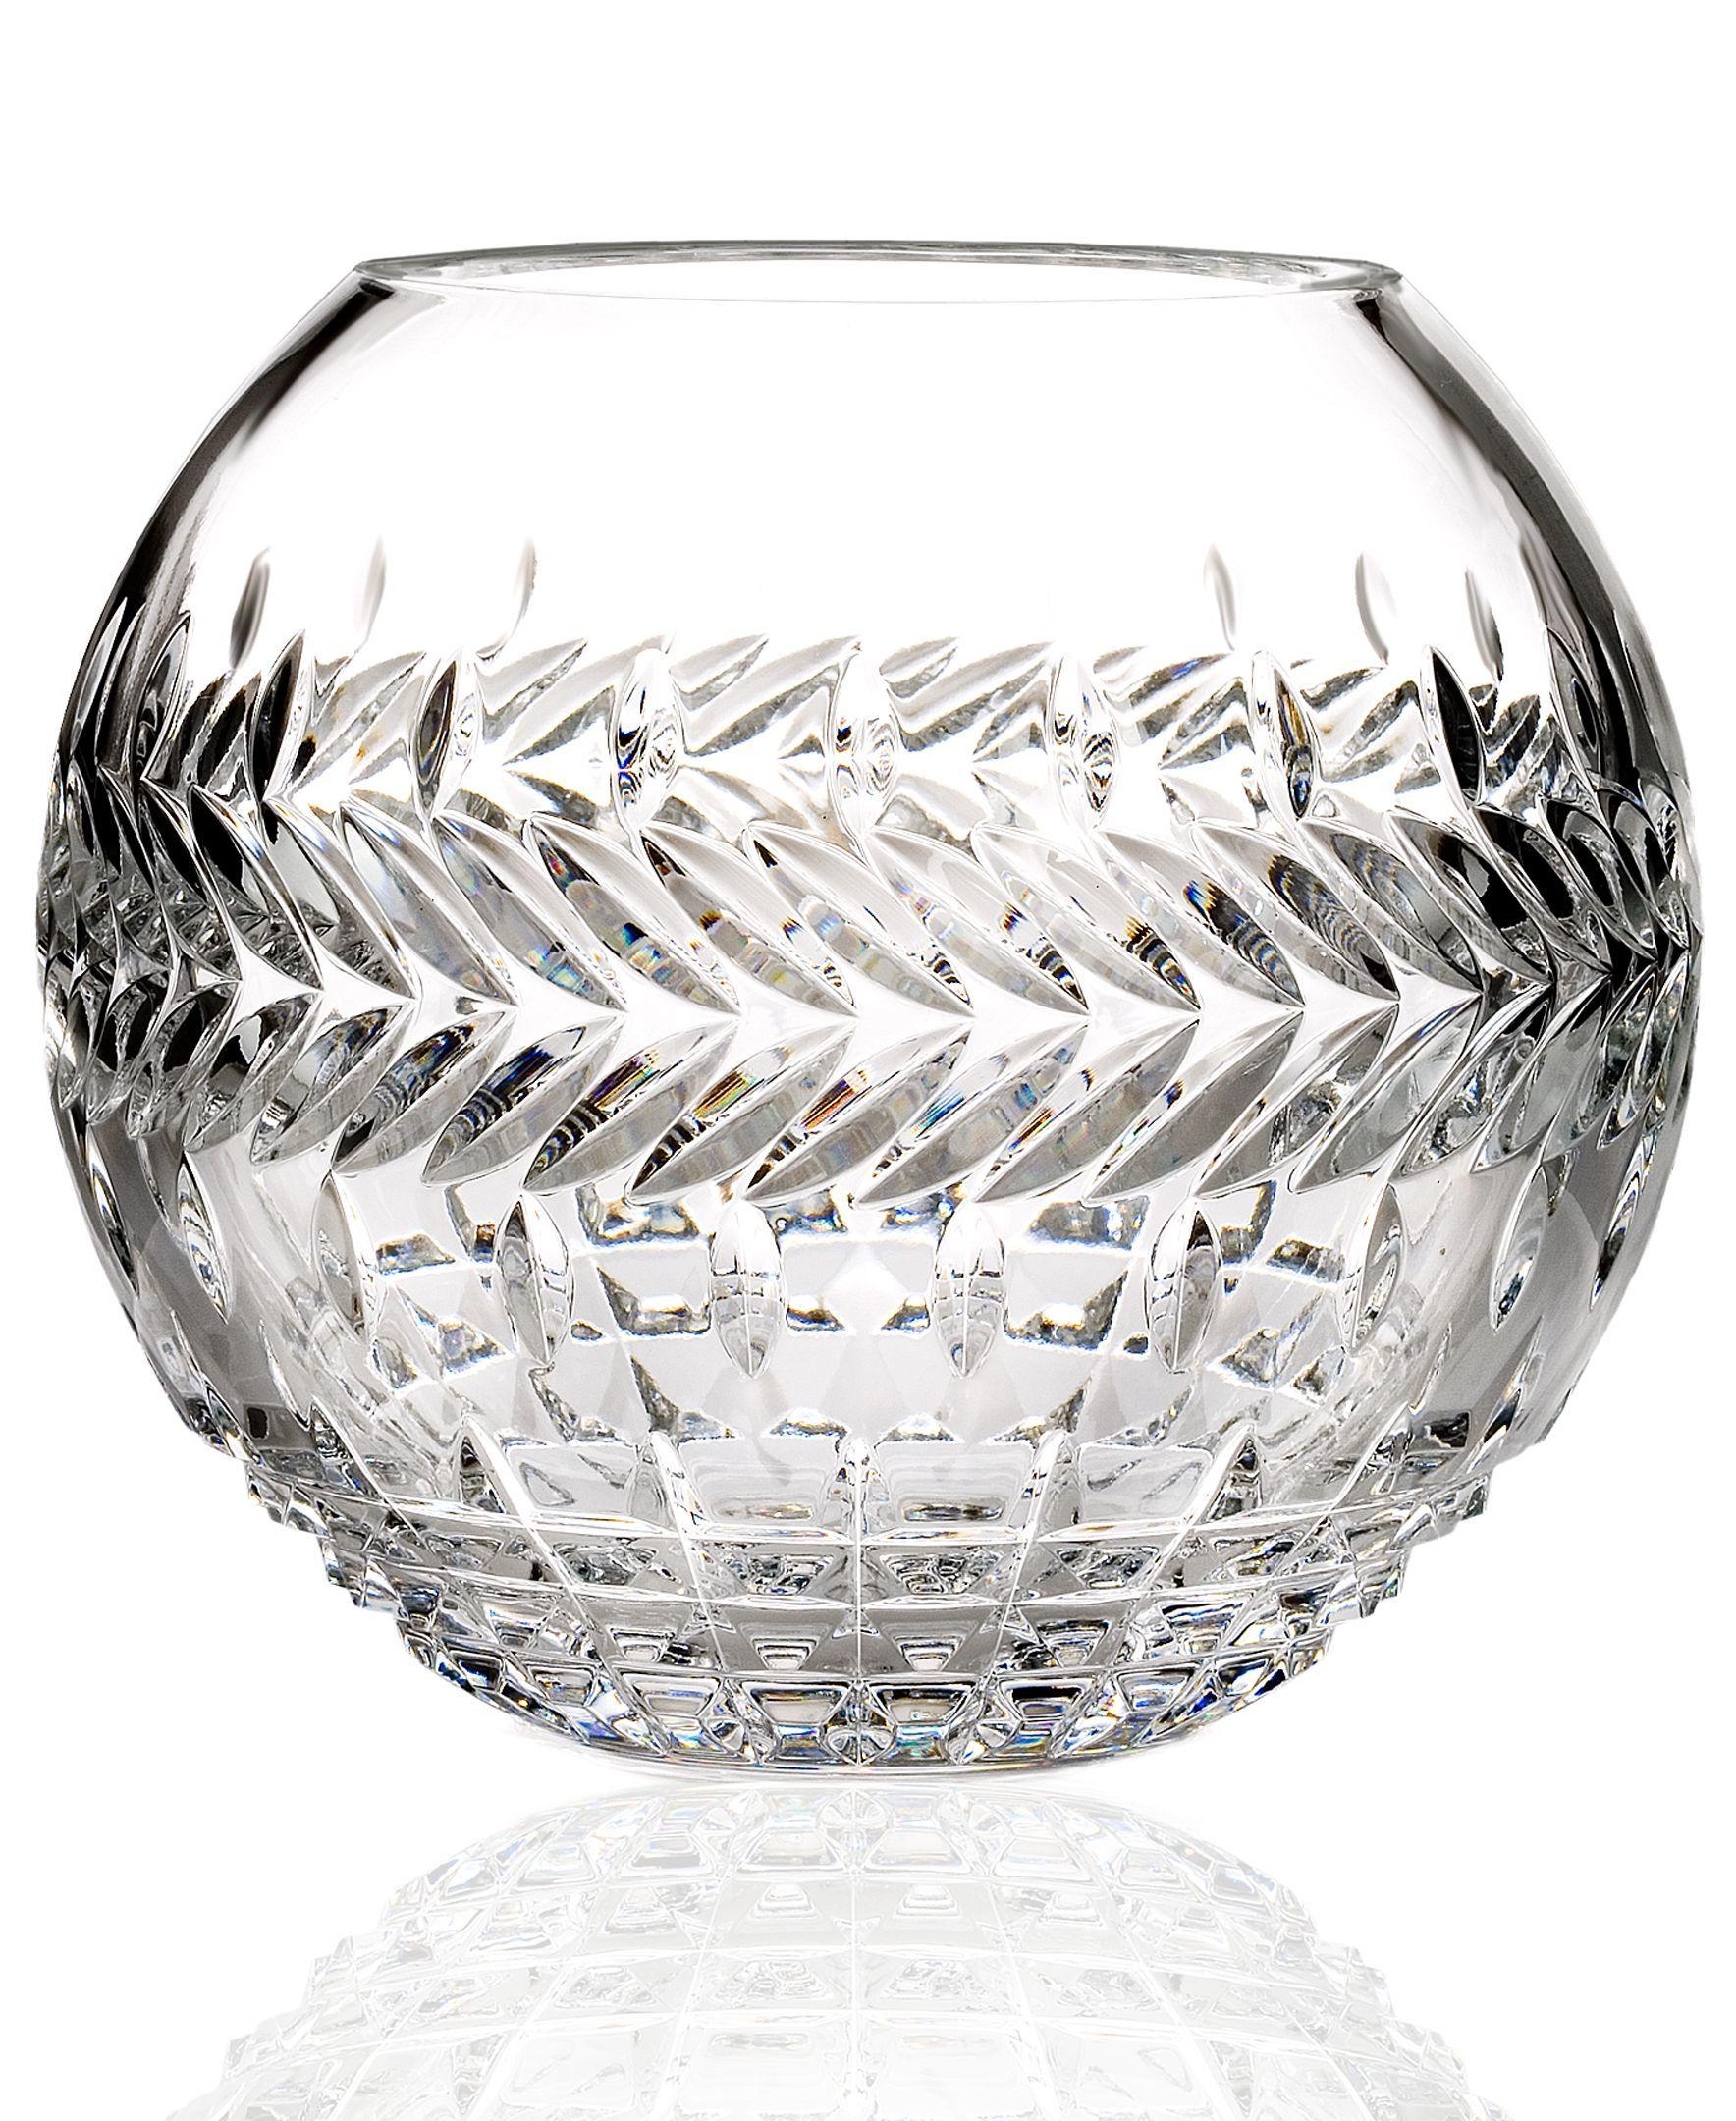 Gifts Fleurology Meg Rose Bowl Vase 8 Rose Bowl Waterford Crystal Decorative Bowls